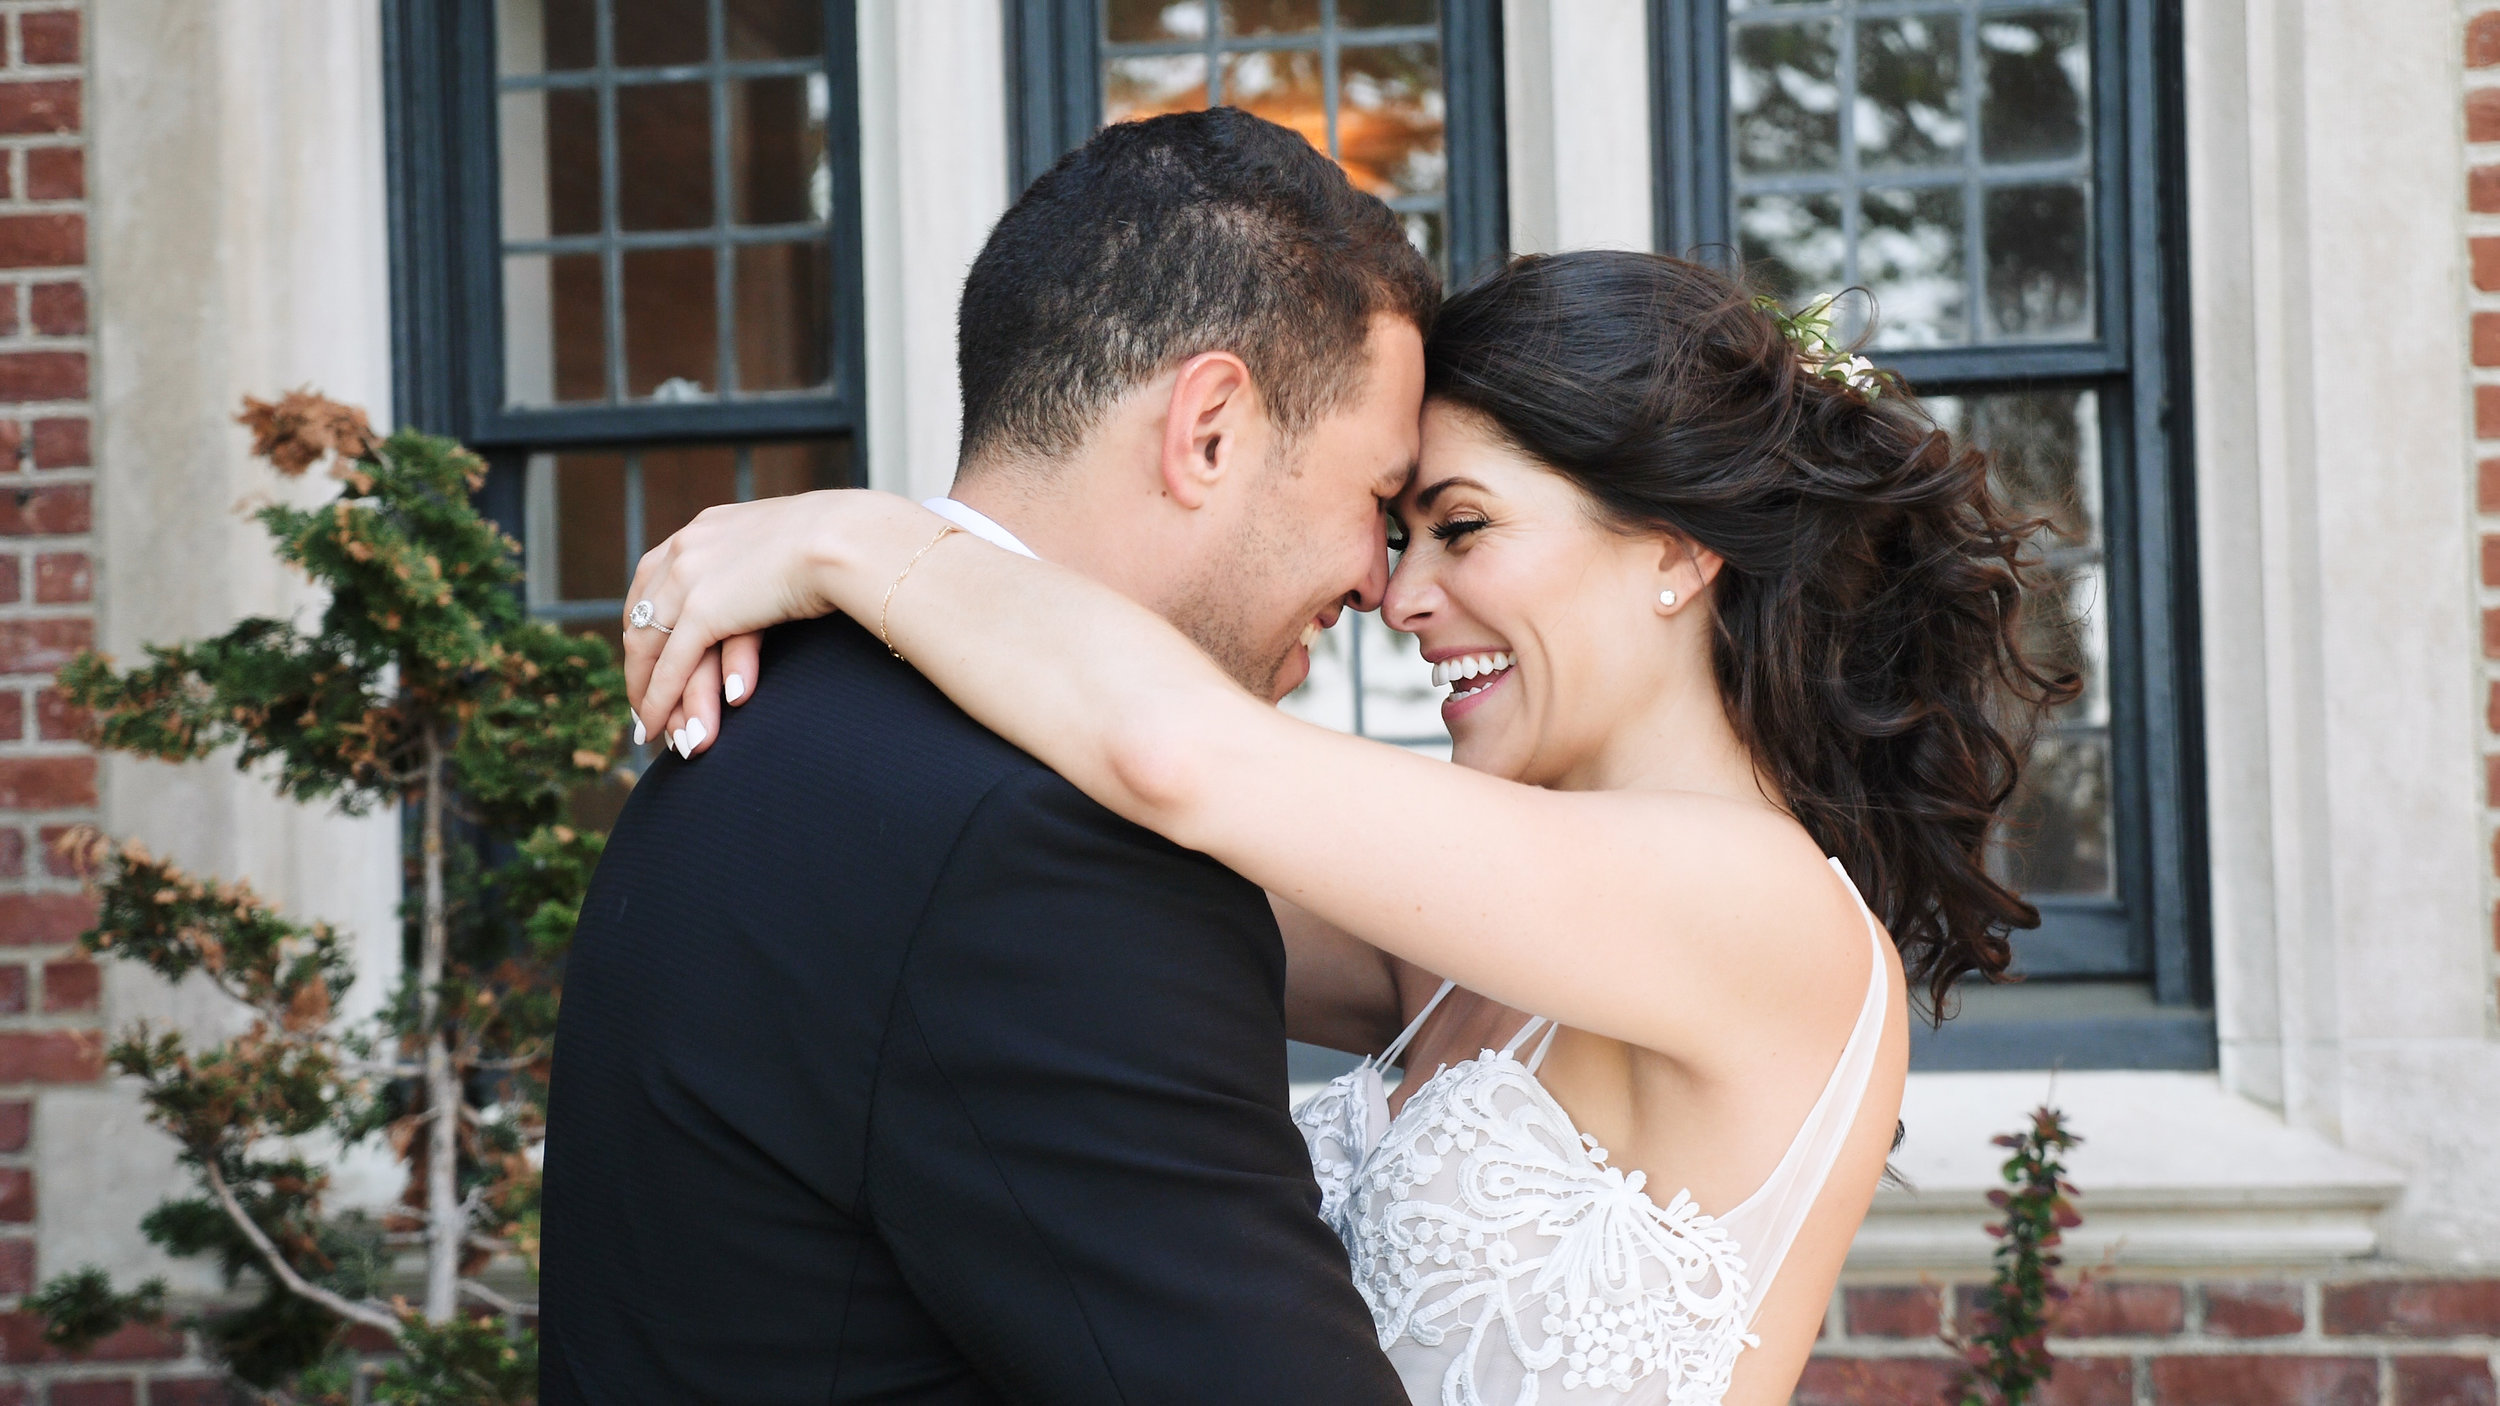 Tonemedia, NJ Wedding Videographer, NJ Wedding Videopgraphy, NJ Wedding Video, Natirar, Natirar Wedding, dreamy natirar wedding, mansion wedding, natirar mansion, Natirar Wedding Video, Nicki and Jason Wedding